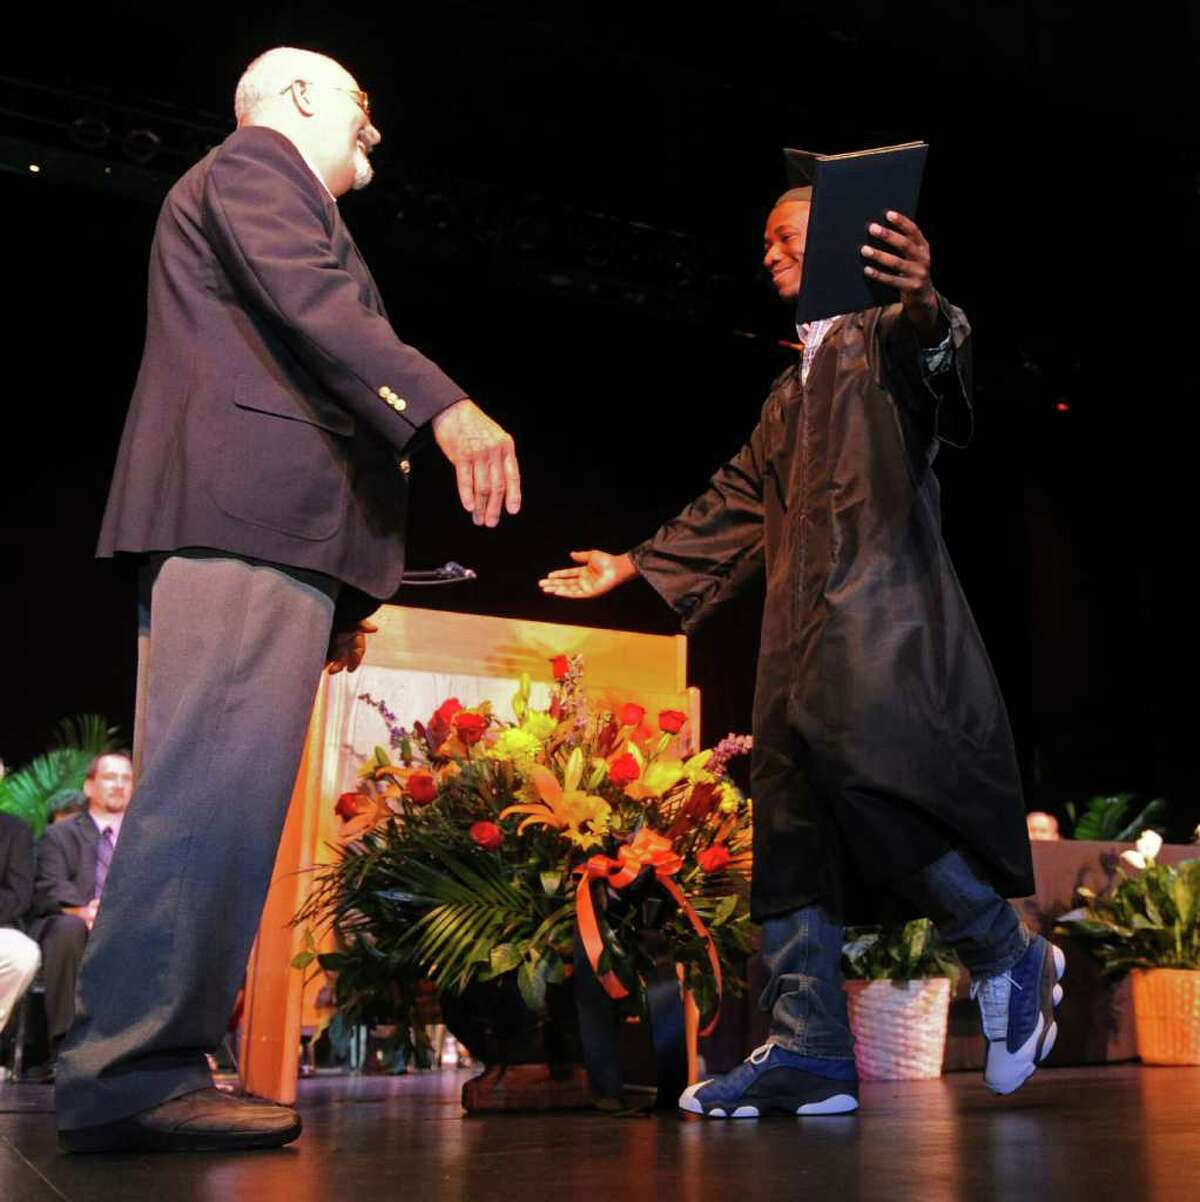 Bullard Havens graduation ceremony at the Klein Memorial Auditorium in Bridgeport, Conn., on June 16, 2011.